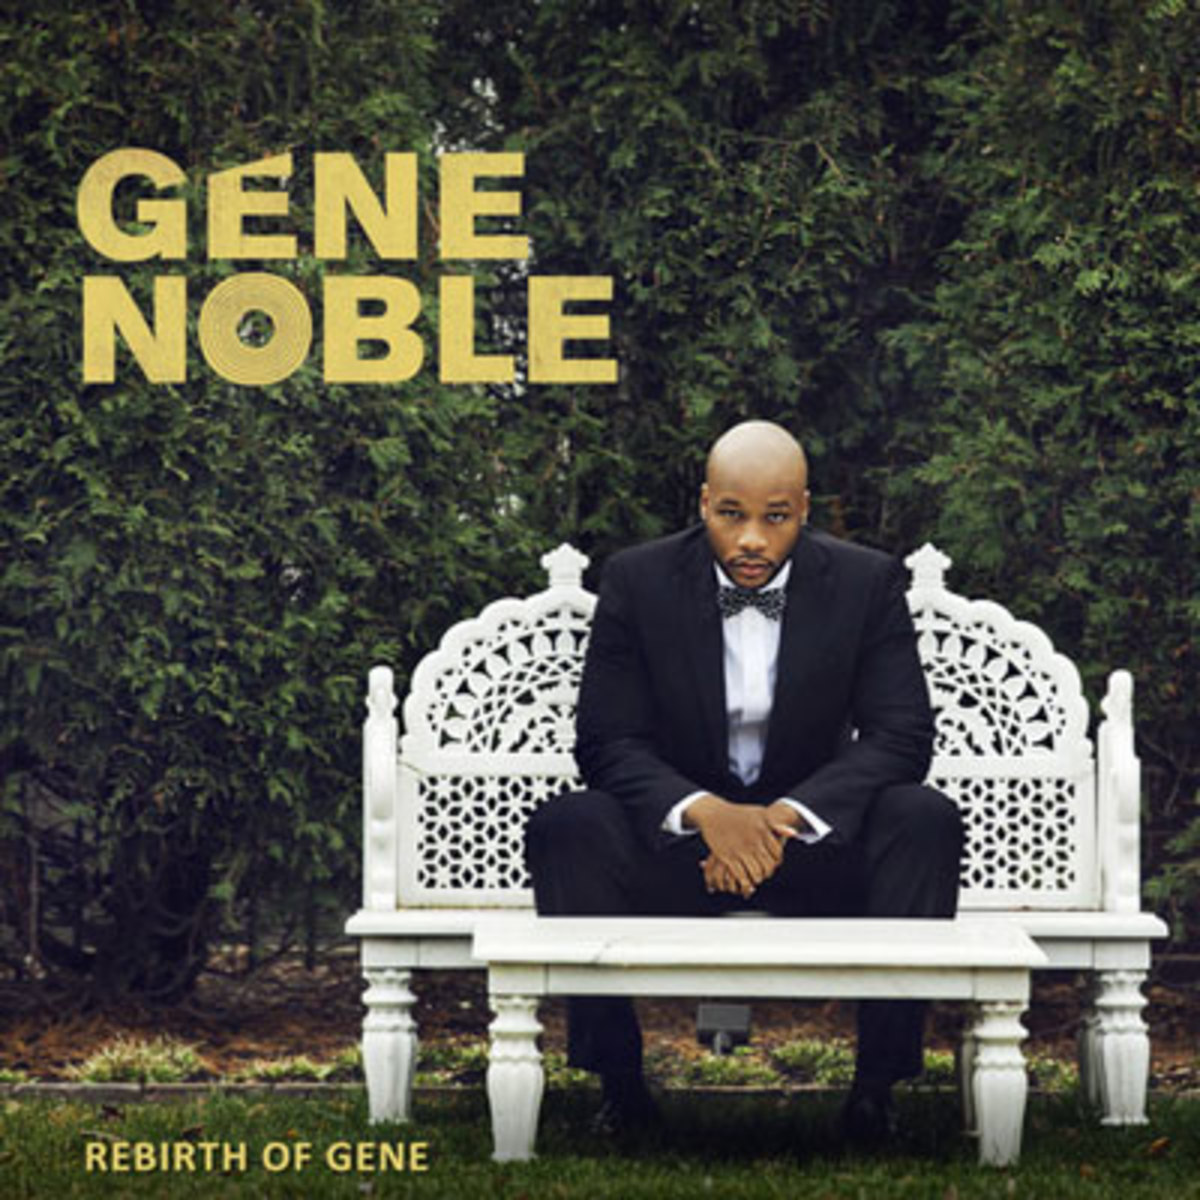 genenoble-rebirth.jpg